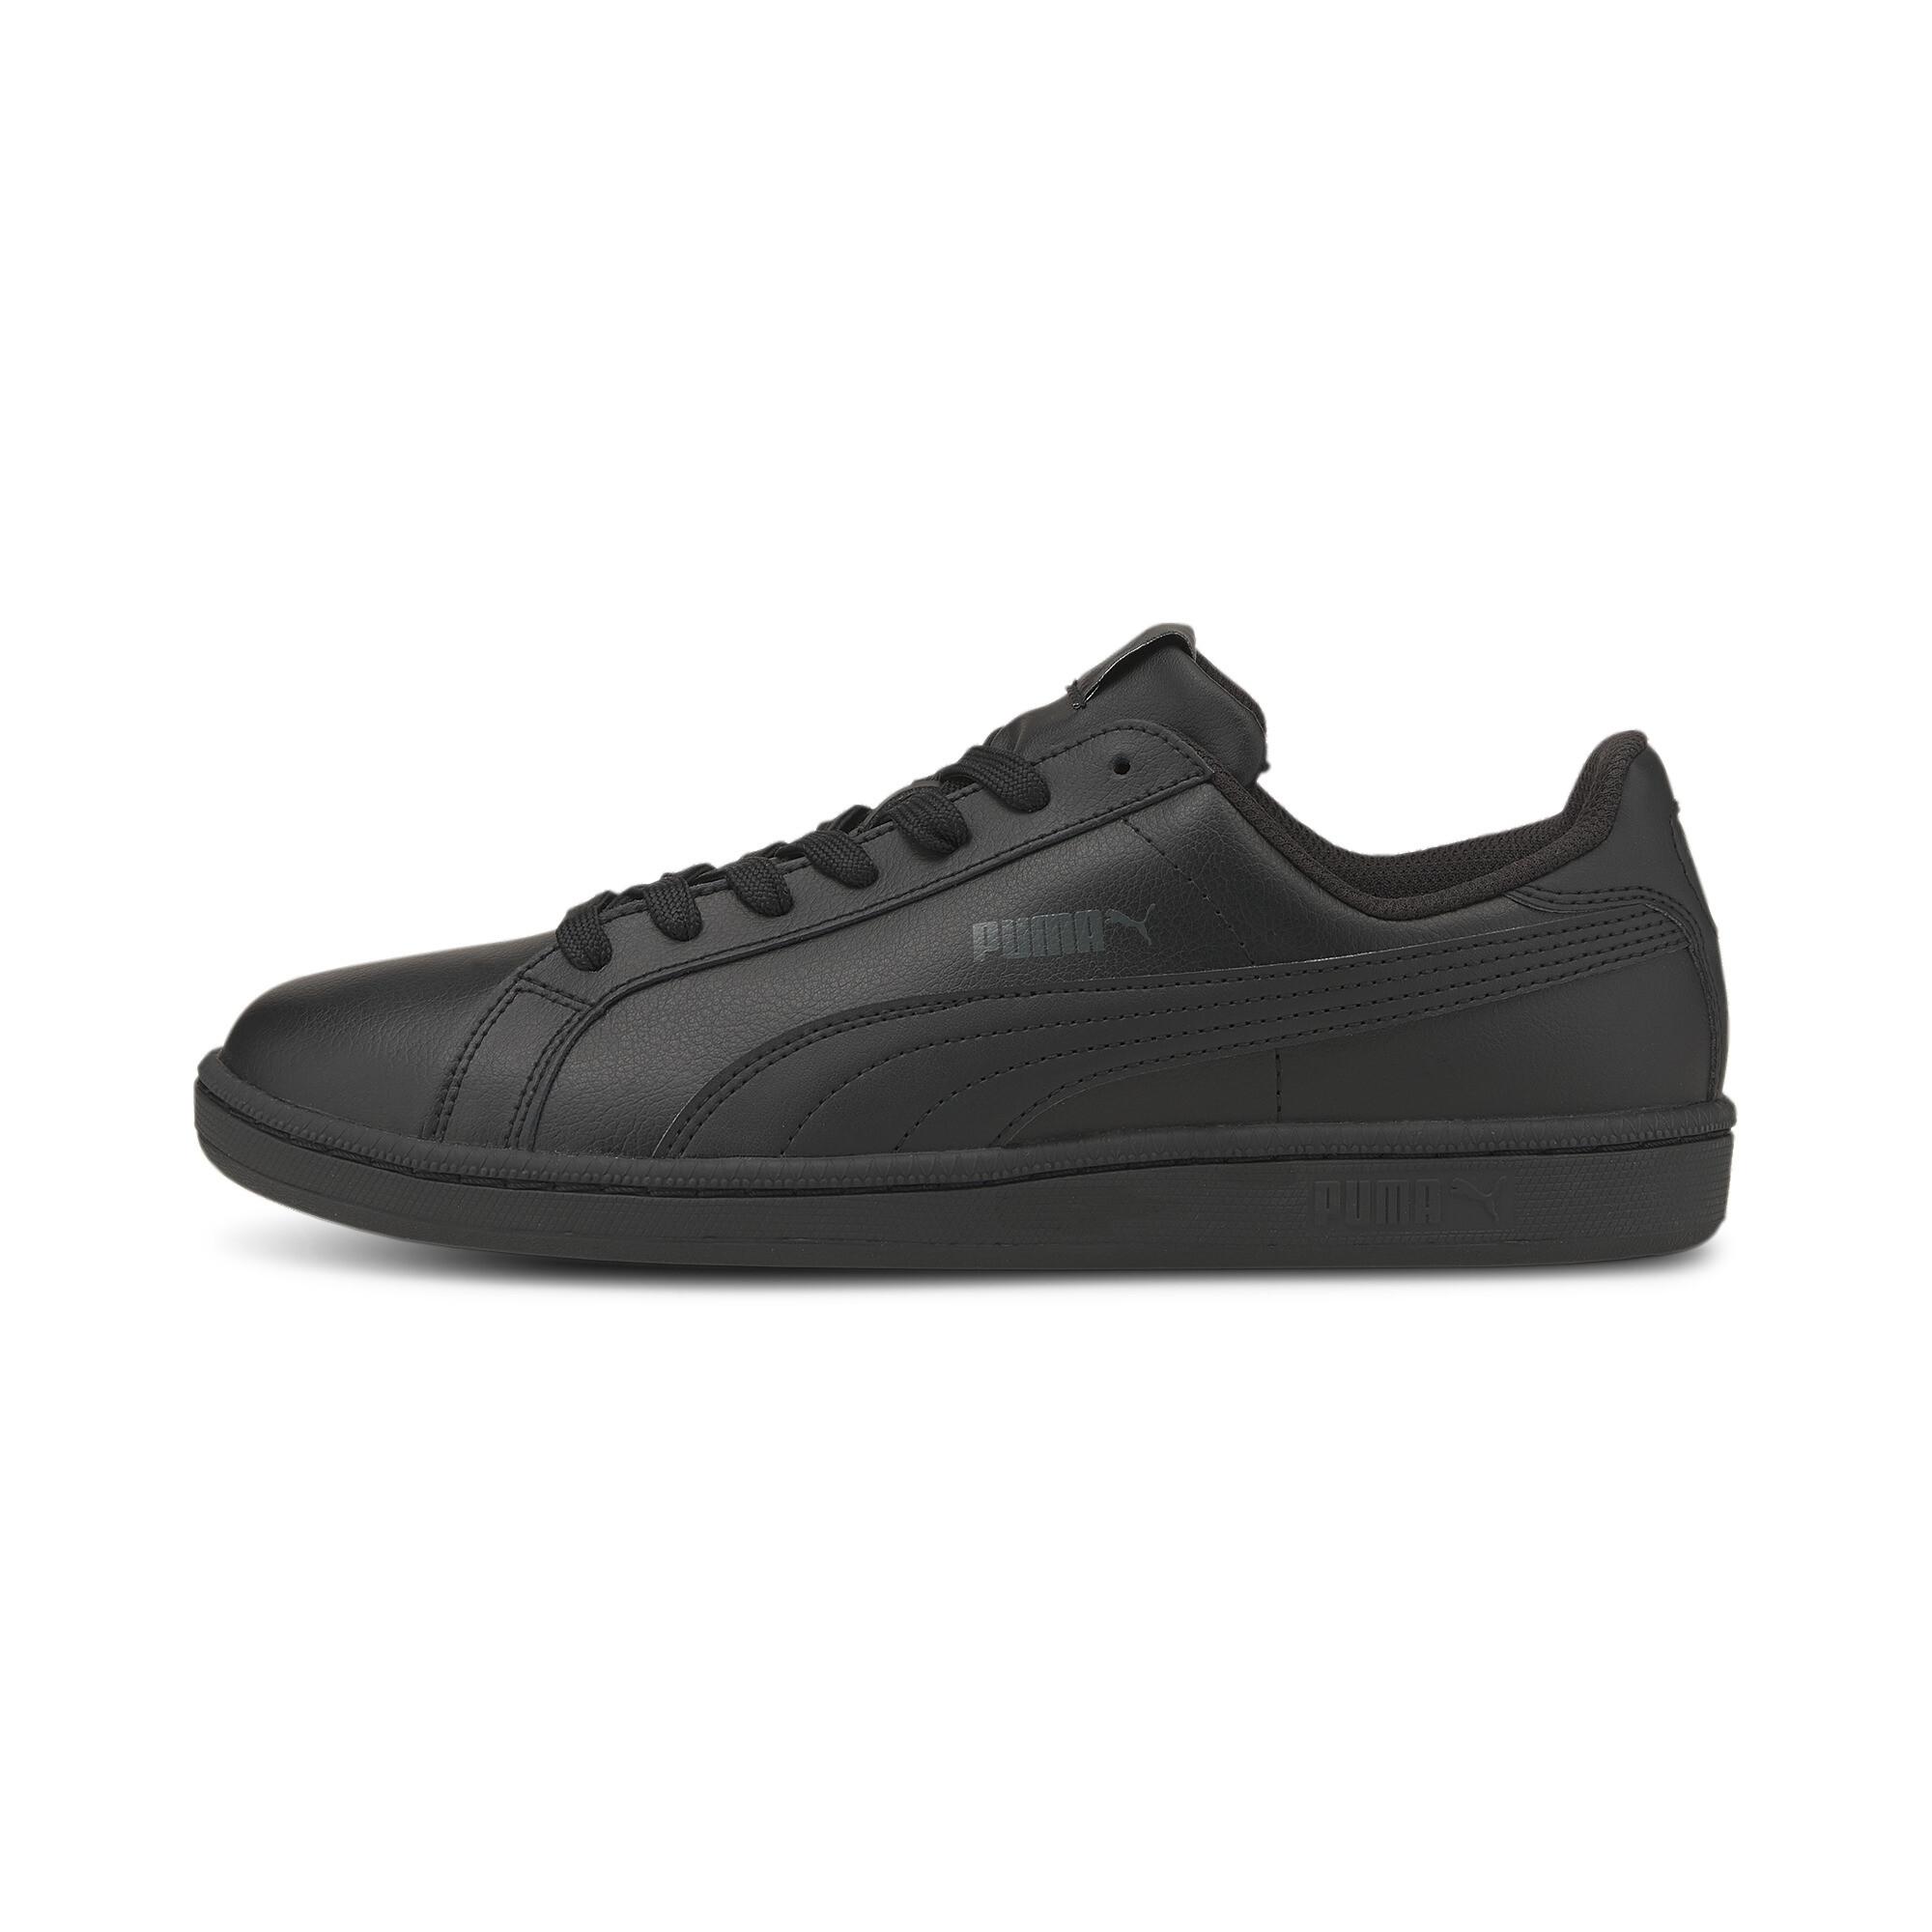 Indexbild 4 - PUMA Smash Trainers Schuhe Sneakers Sport Classics Unisex Neu